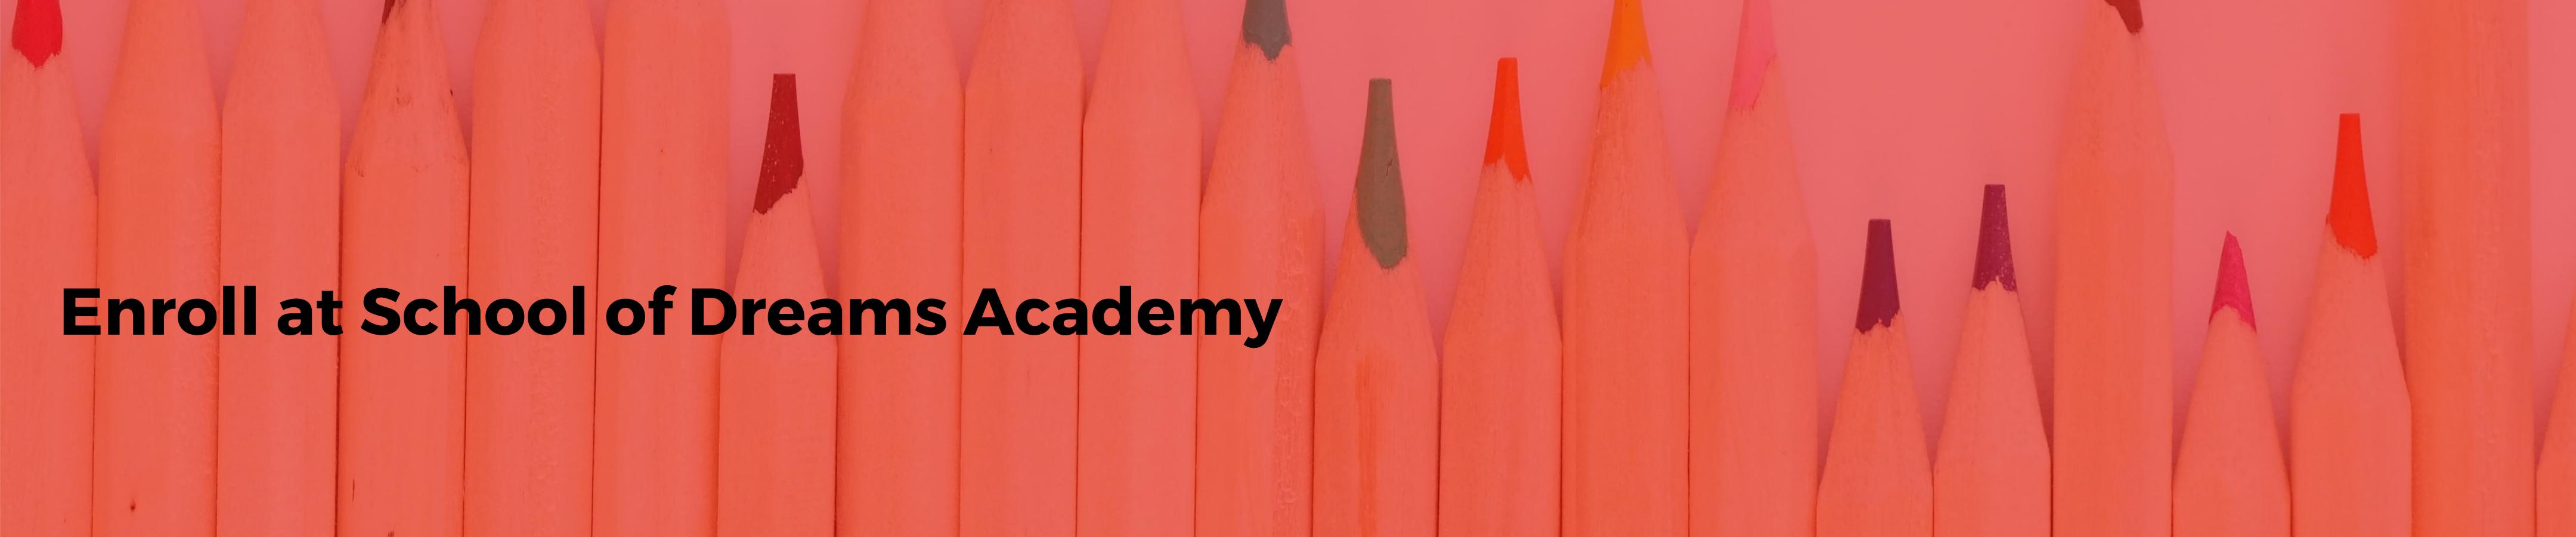 Enroll at School of Dreams Academy